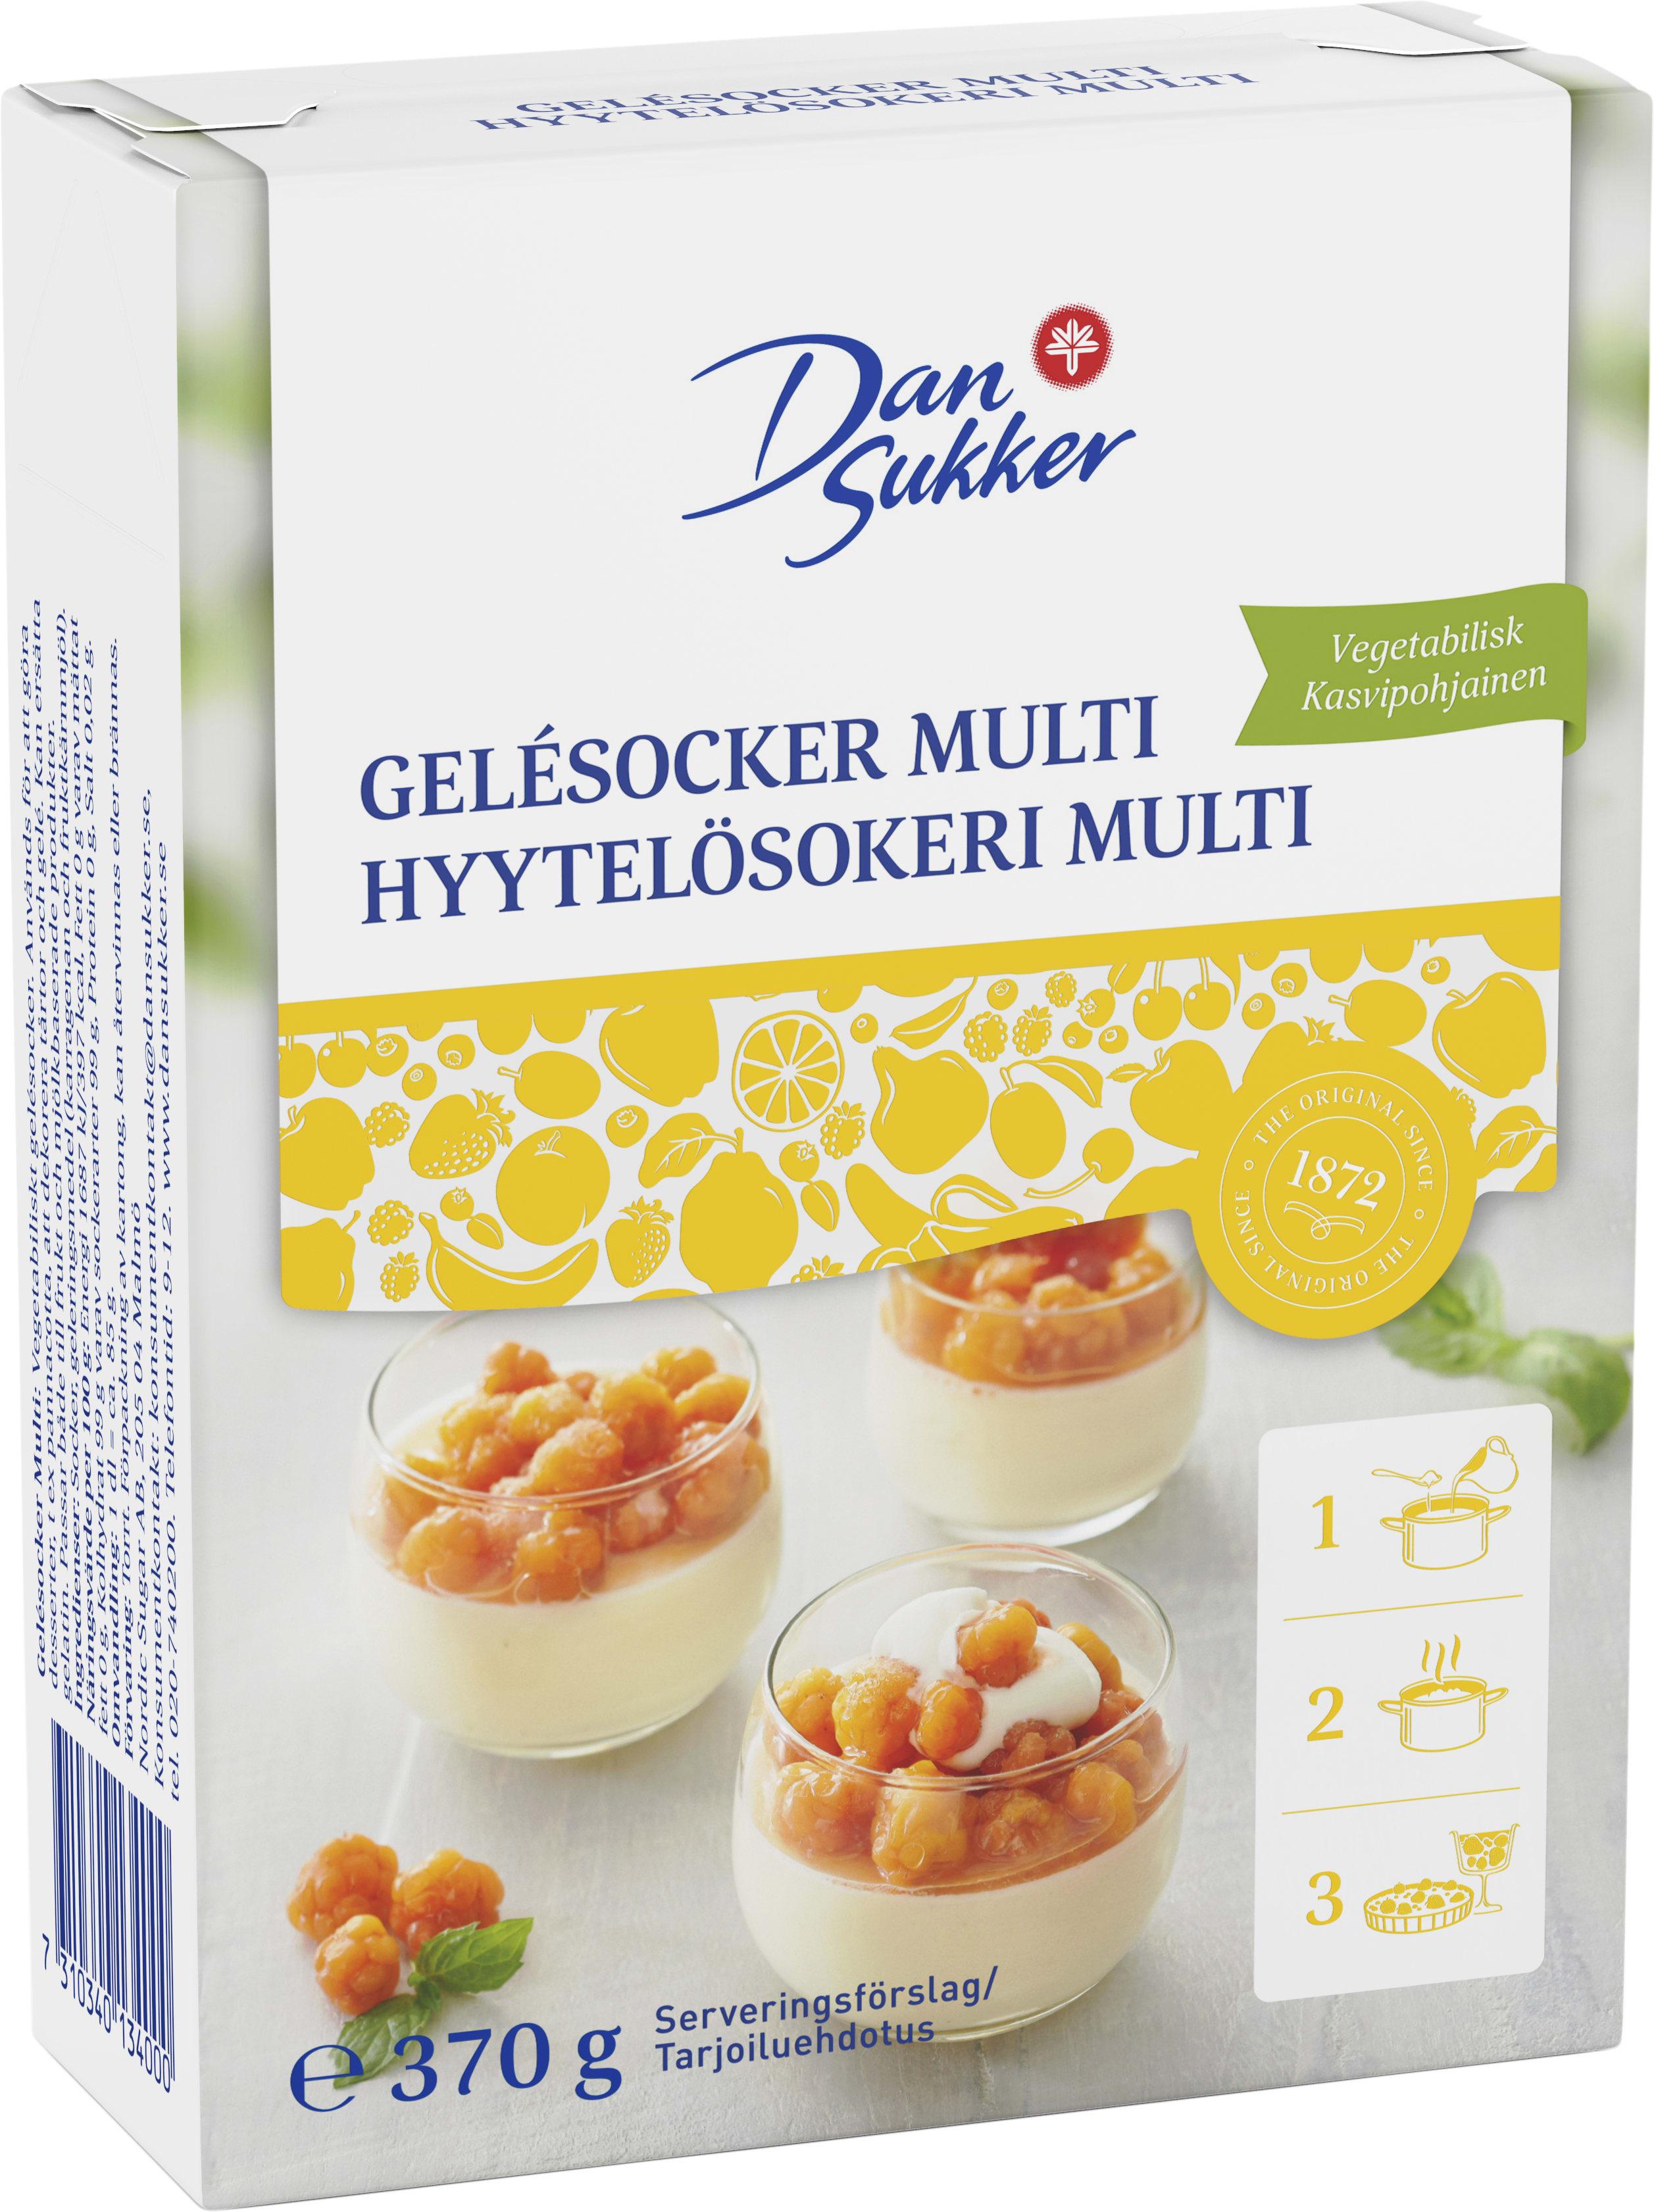 Gelesocker Multi - DAN SUKKER   Coop